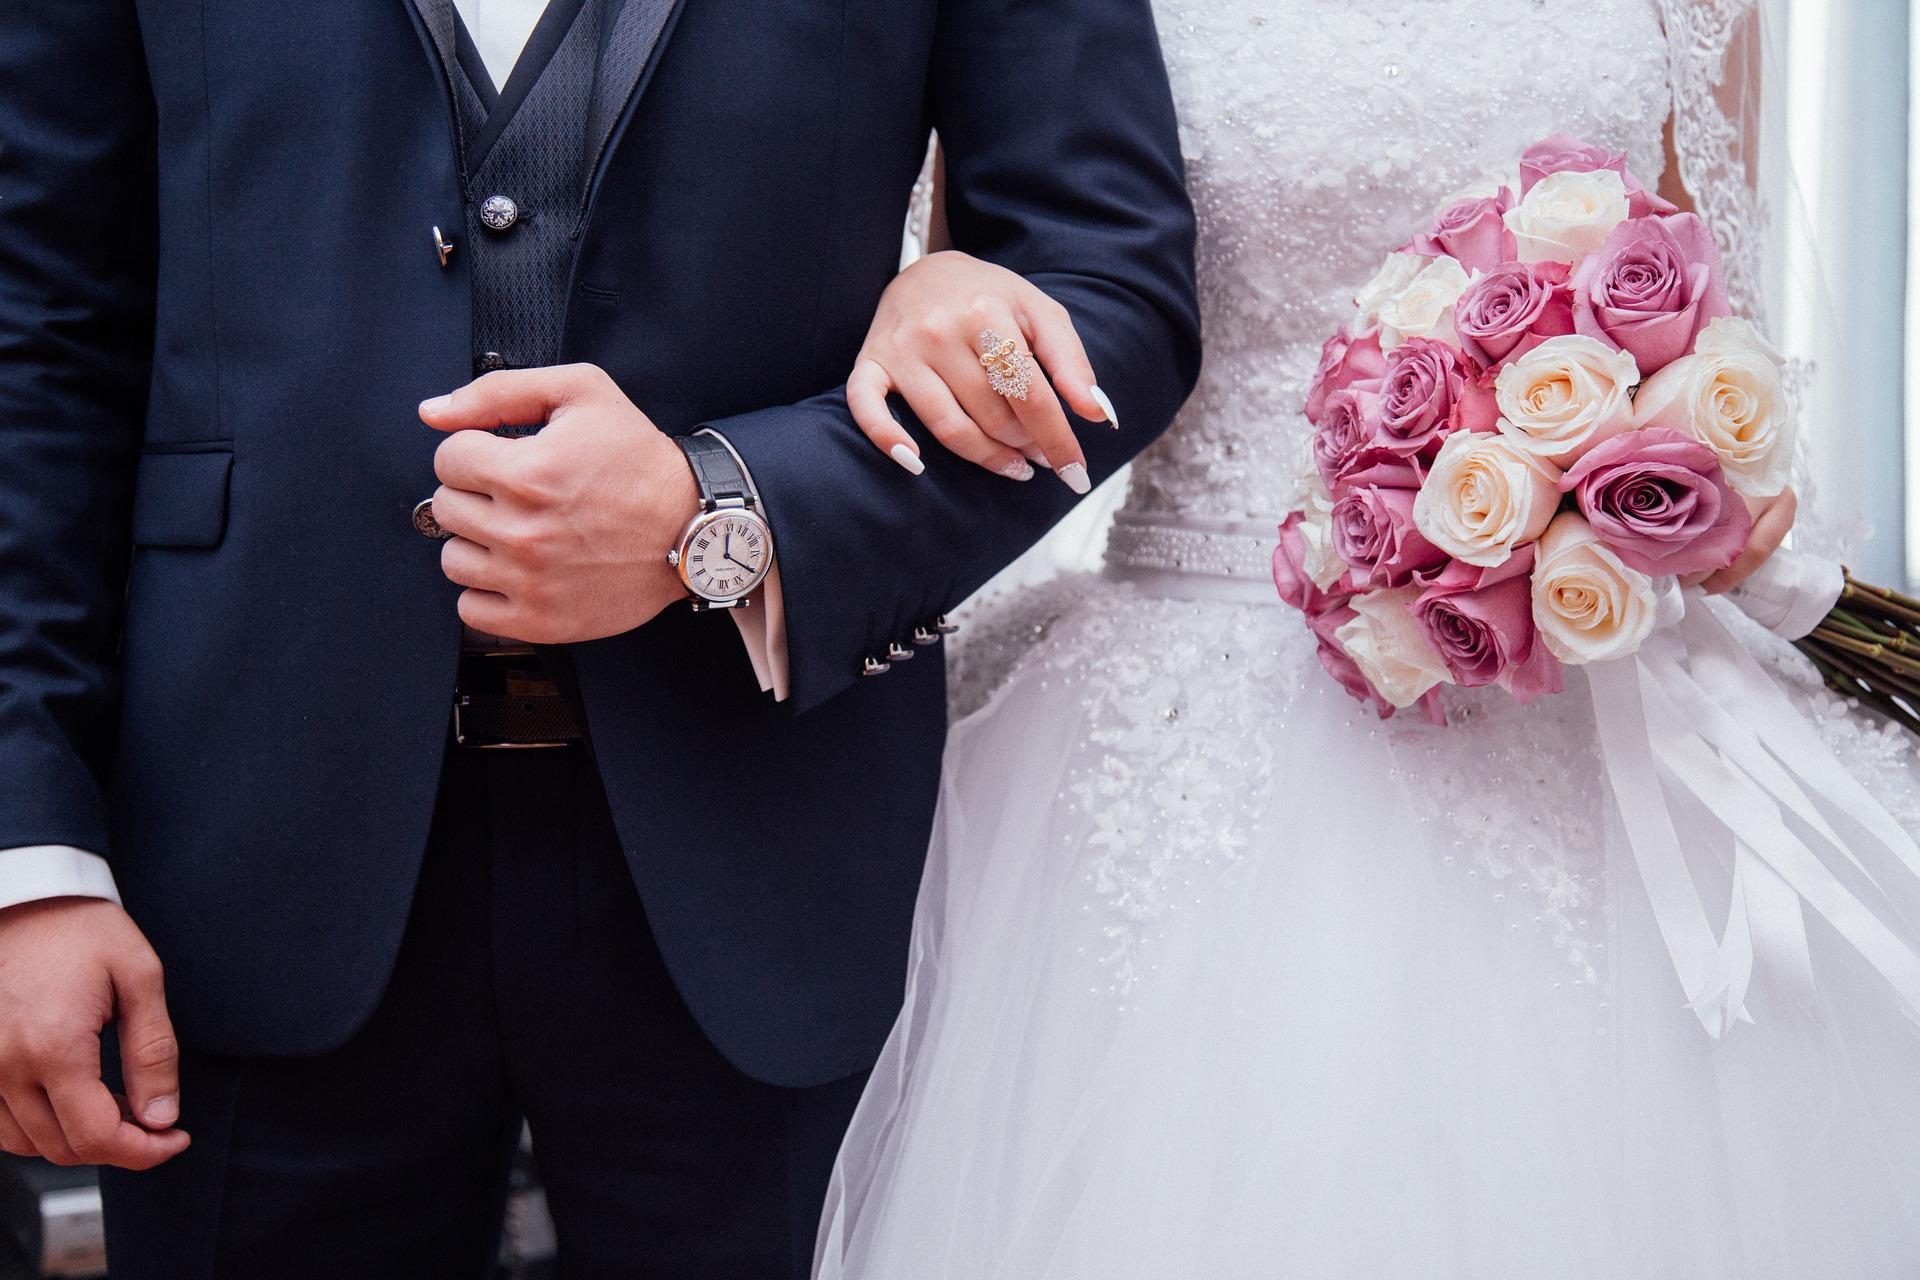 mise a disposition chauffeur taxi vtc mariage evenementiel